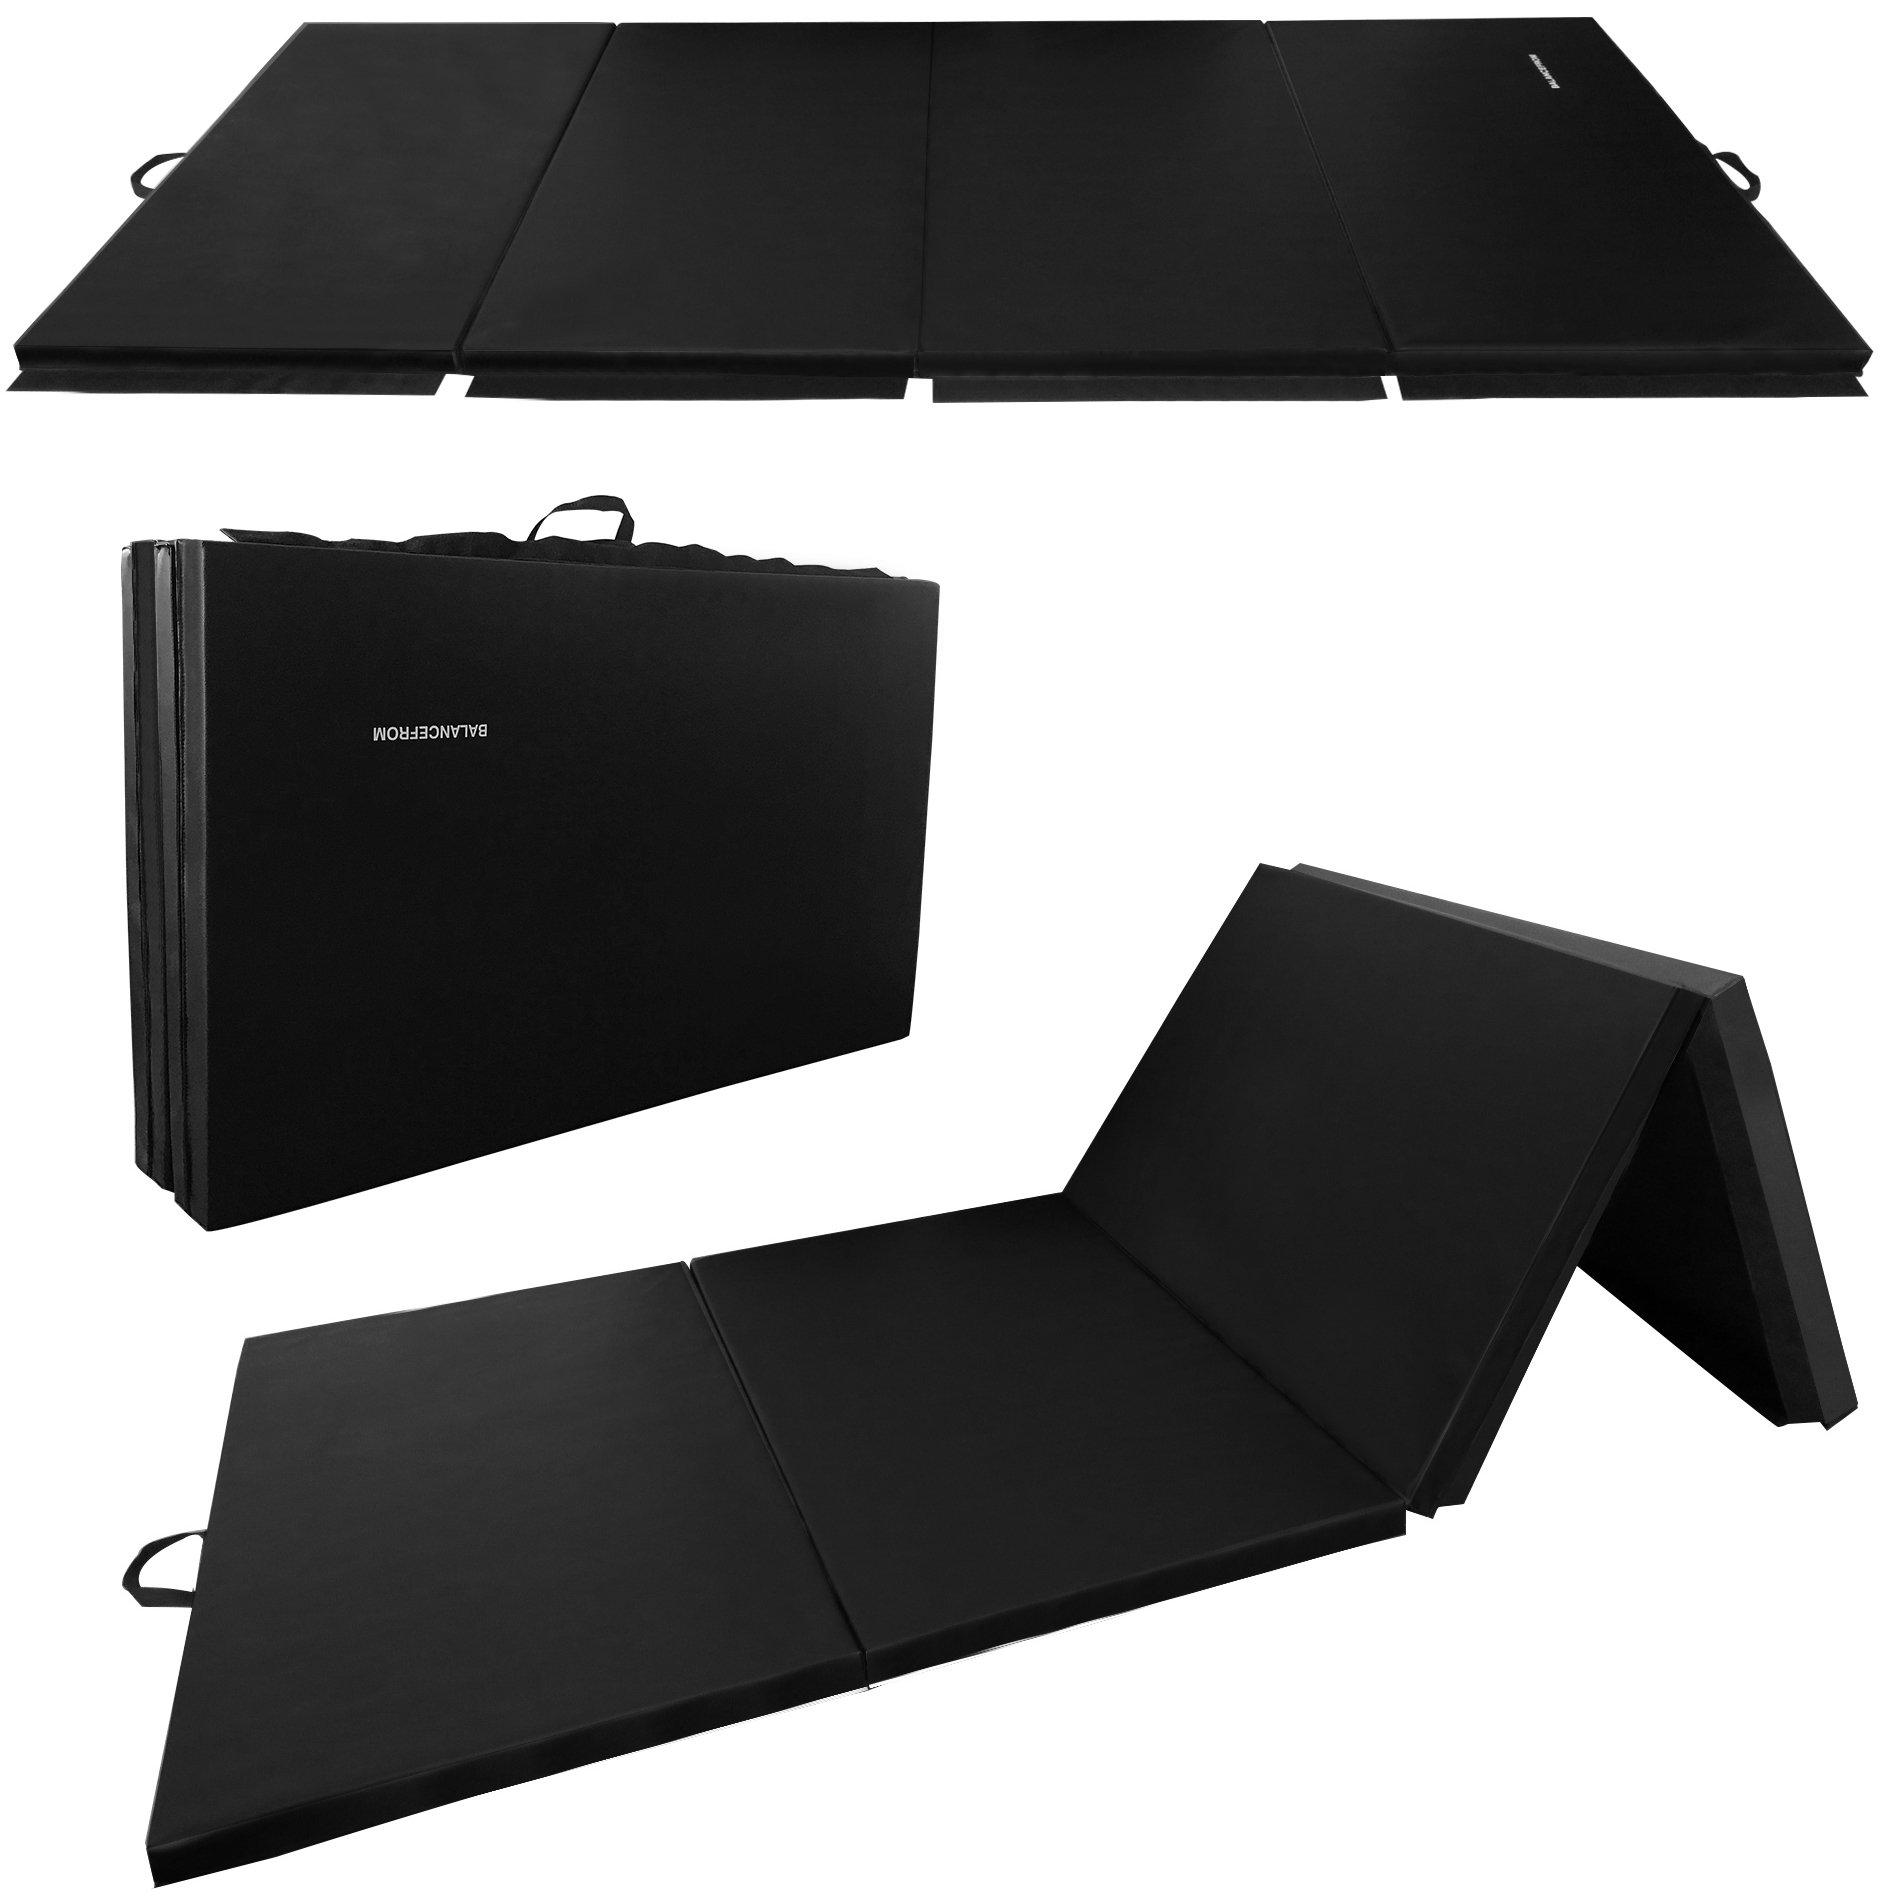 BalanceFrom GoGym All-Purpose 4'x10'x2 Extra Thick High Density Anti-Tear Gymnastics Gym Folding Exercise Aerobics Mats (Black) by BalanceFrom